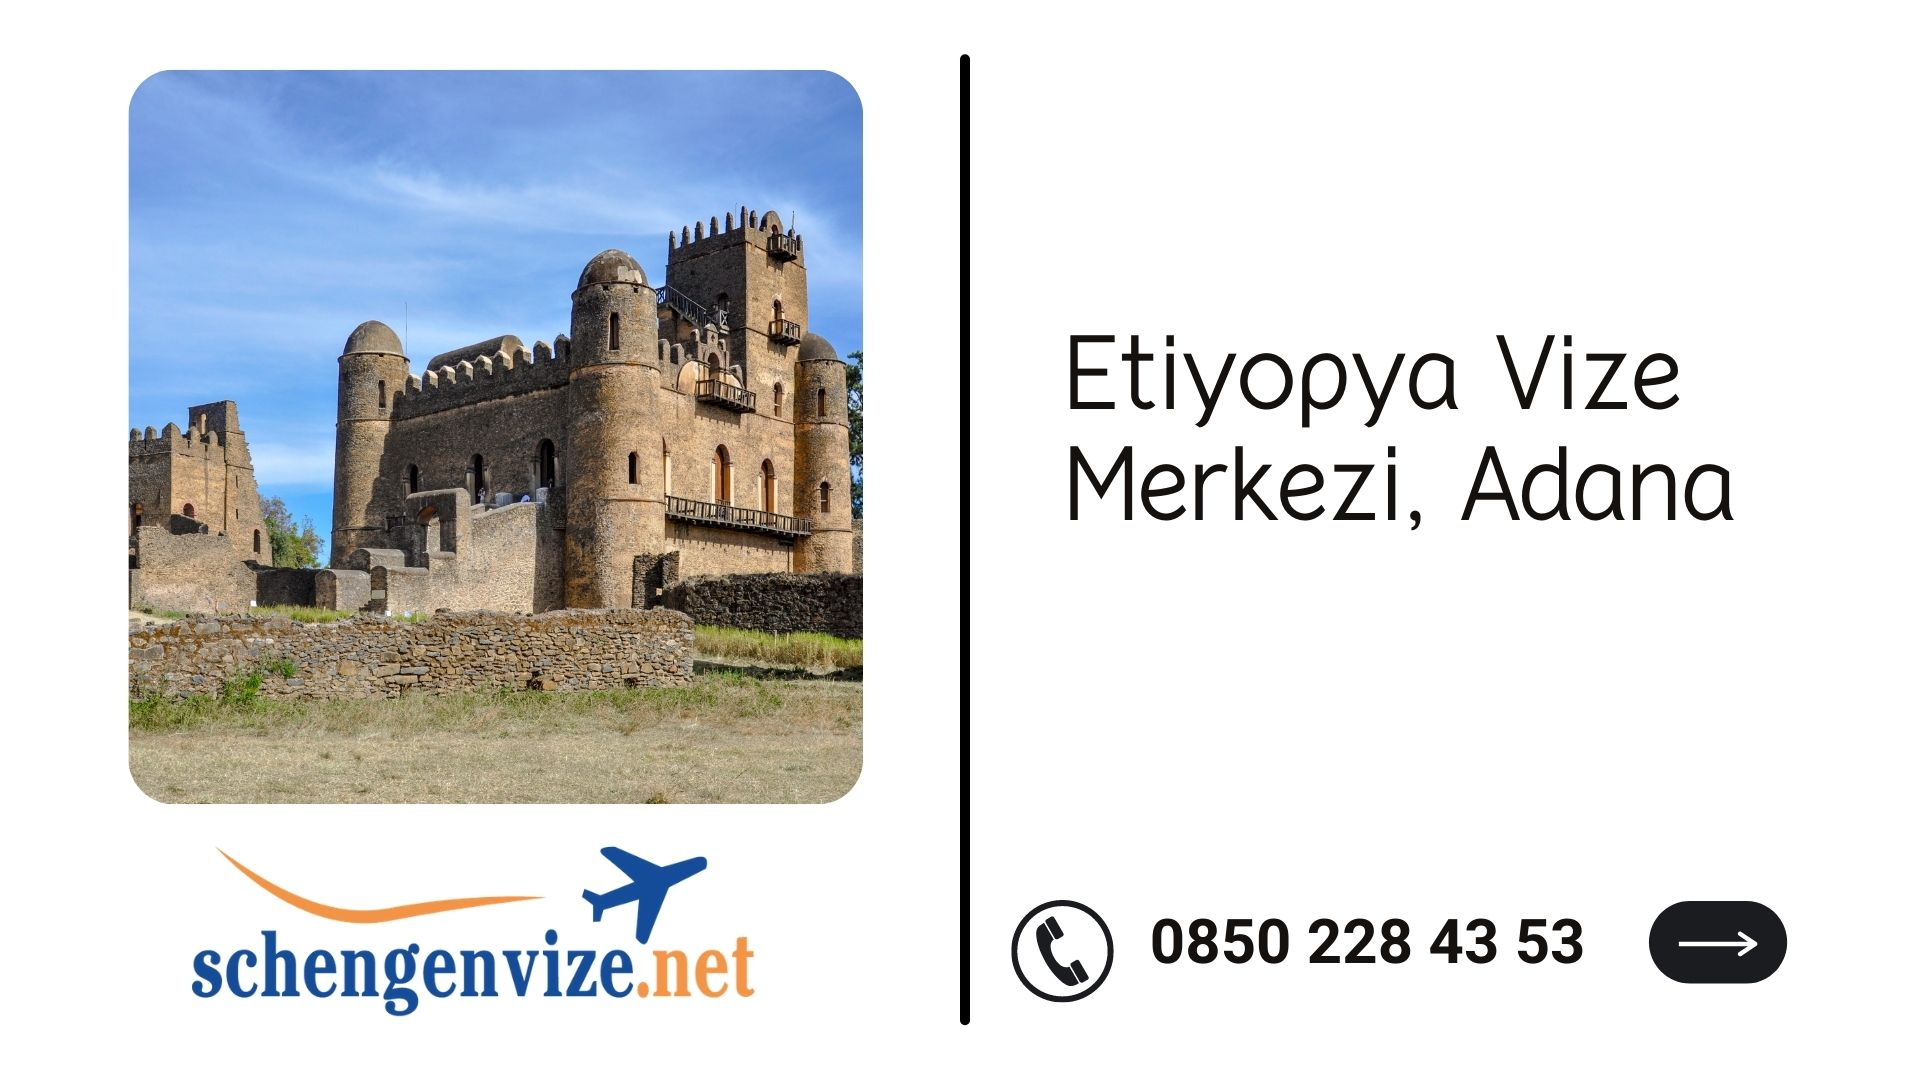 Etiyopya Vize Merkezi, Adana